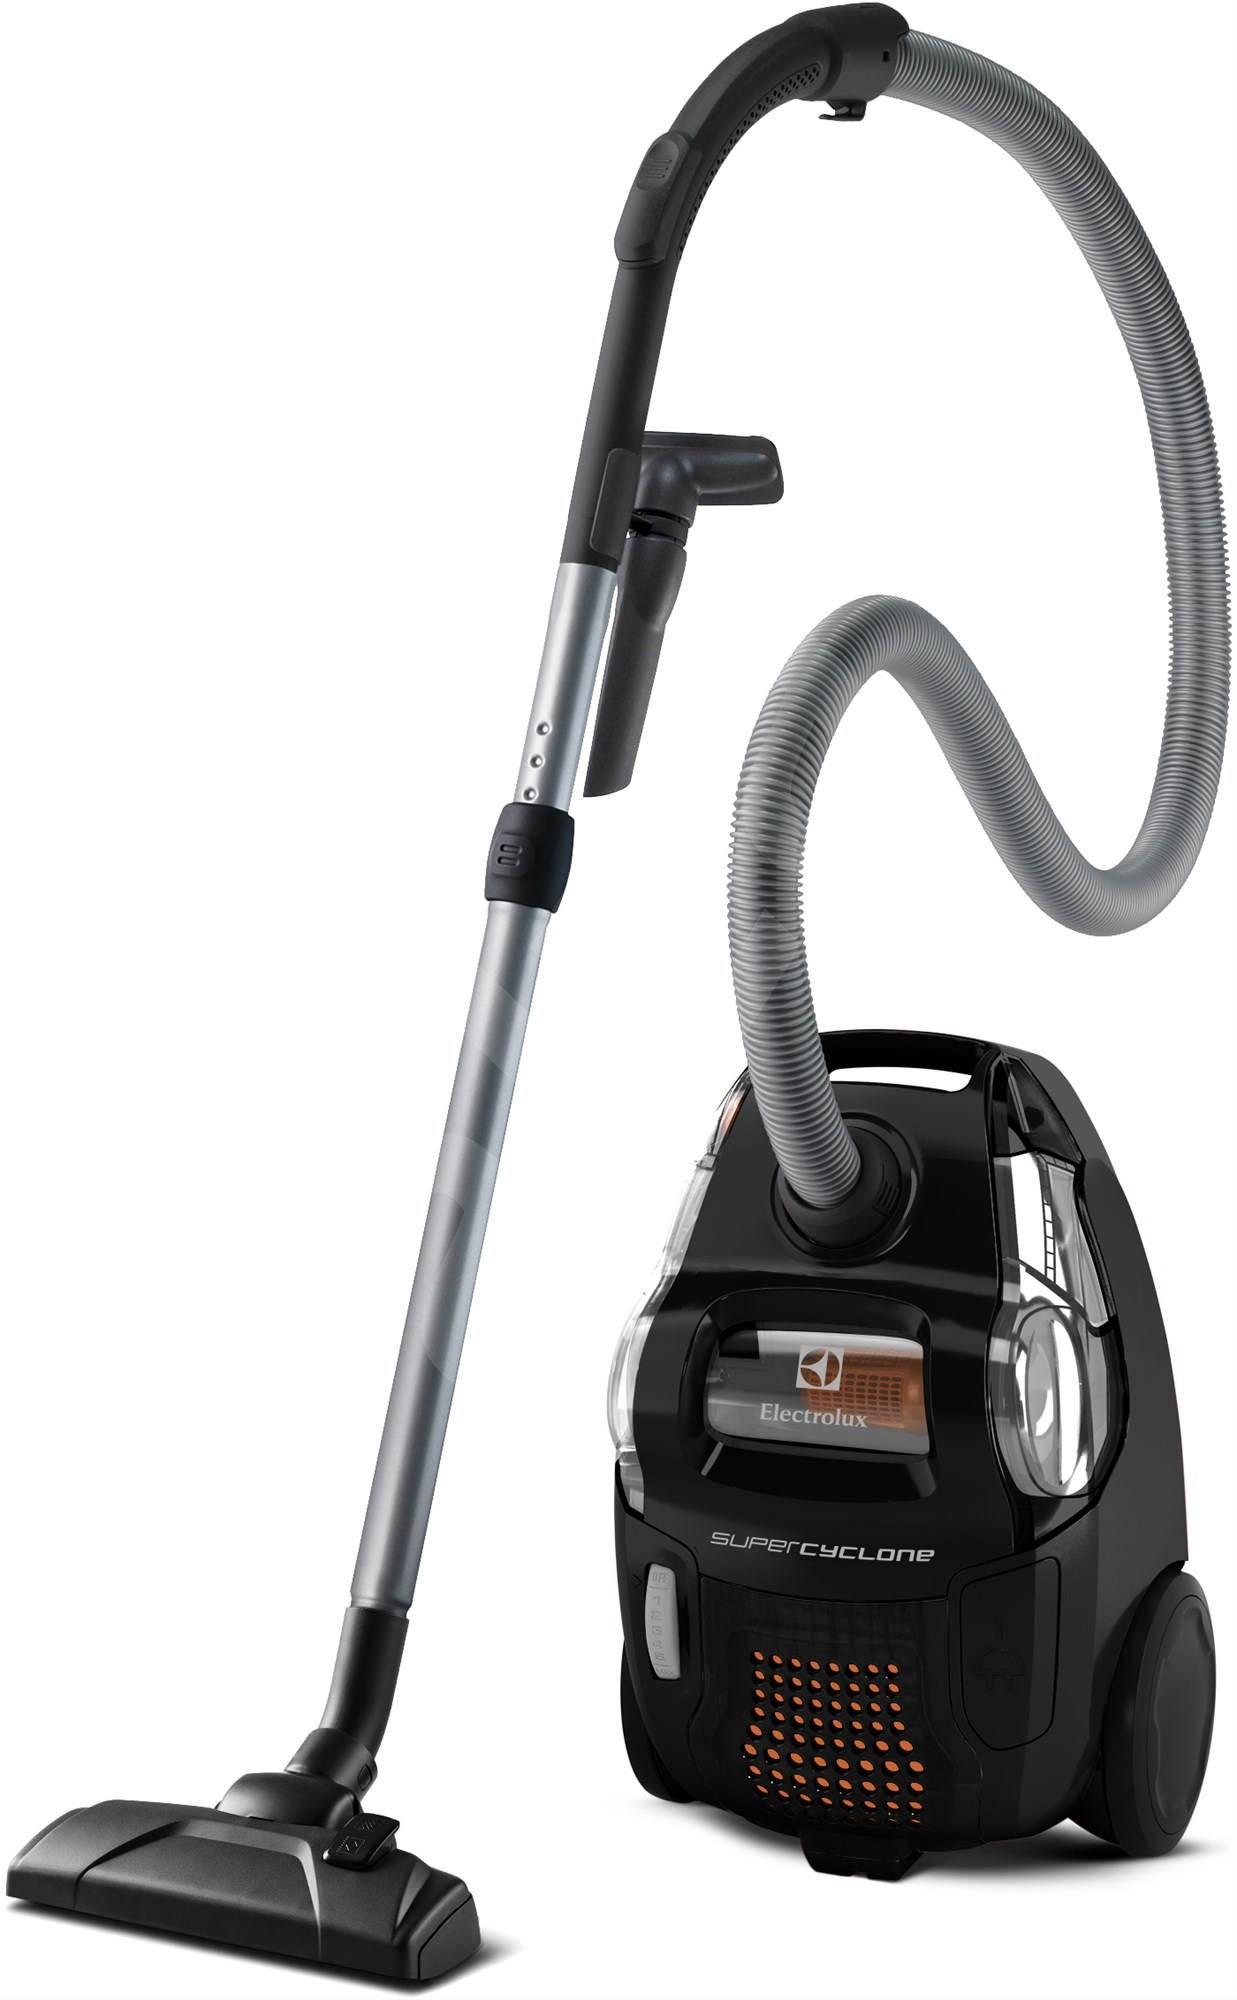 Electrolux SCTURBO - Bagless vacuum cleaner | Alzashop.com Vacuum